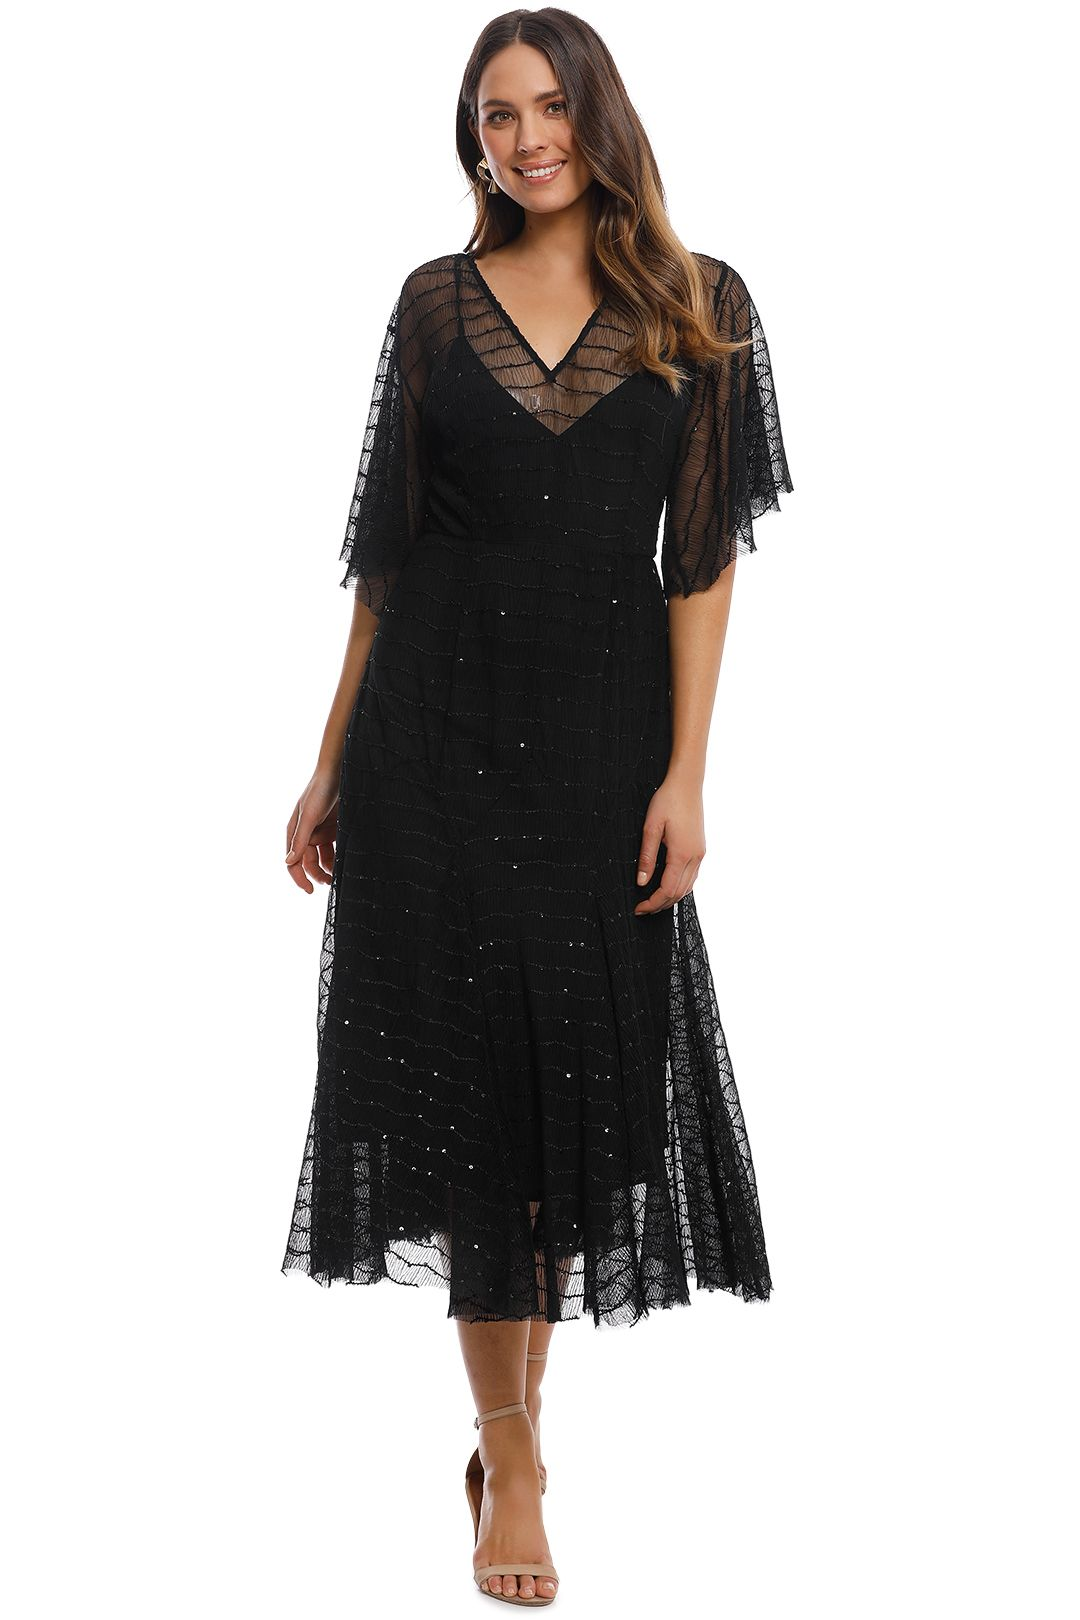 Talulah - Candid Lace Midi Dress - Black - Front